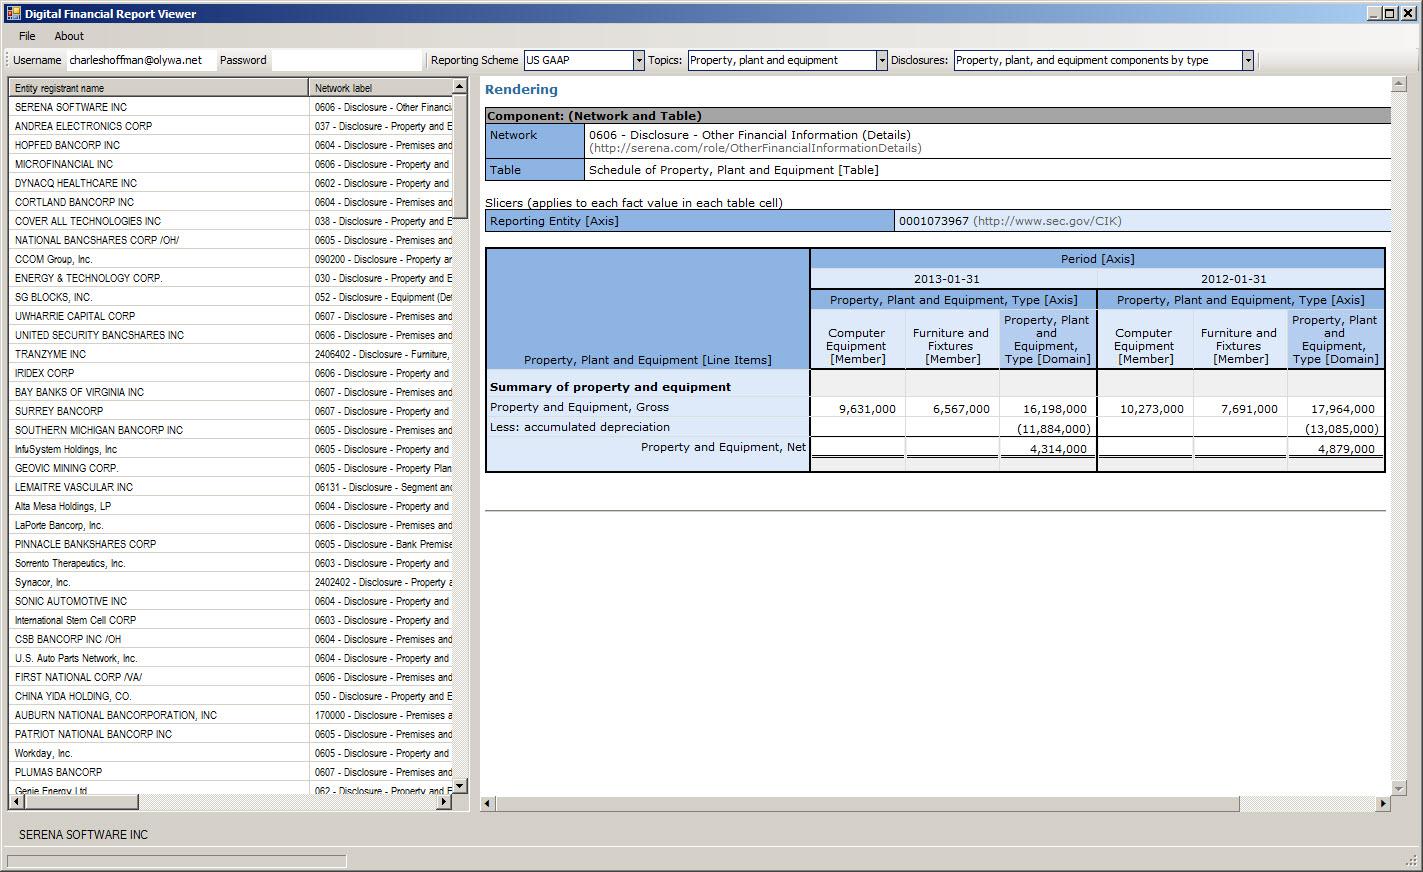 Source Code For Vb Net Digital Financial Report Disclosure